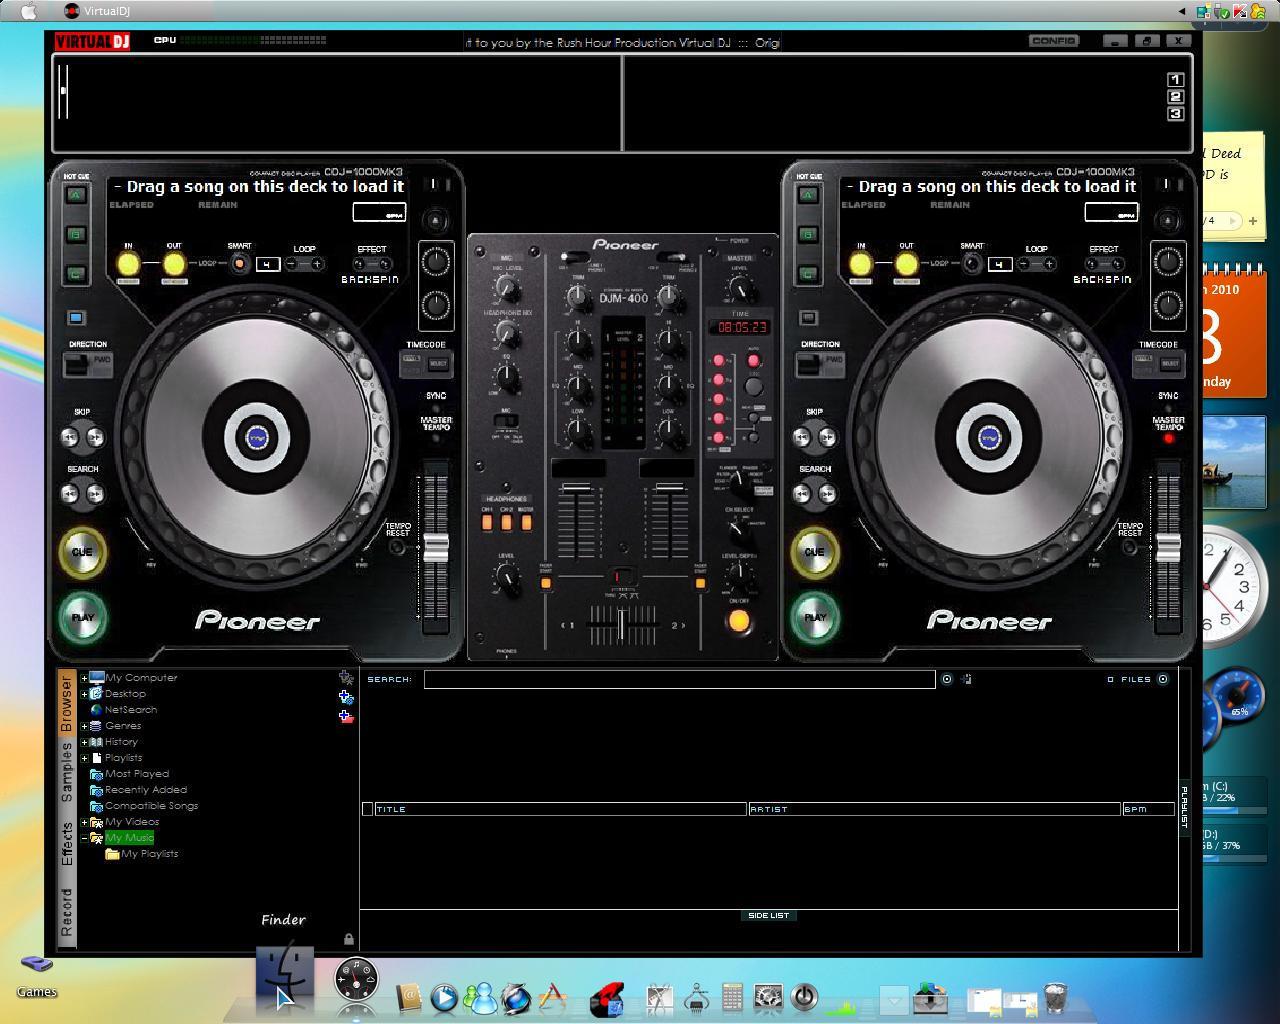 Virtual dj 6.0 full version crack